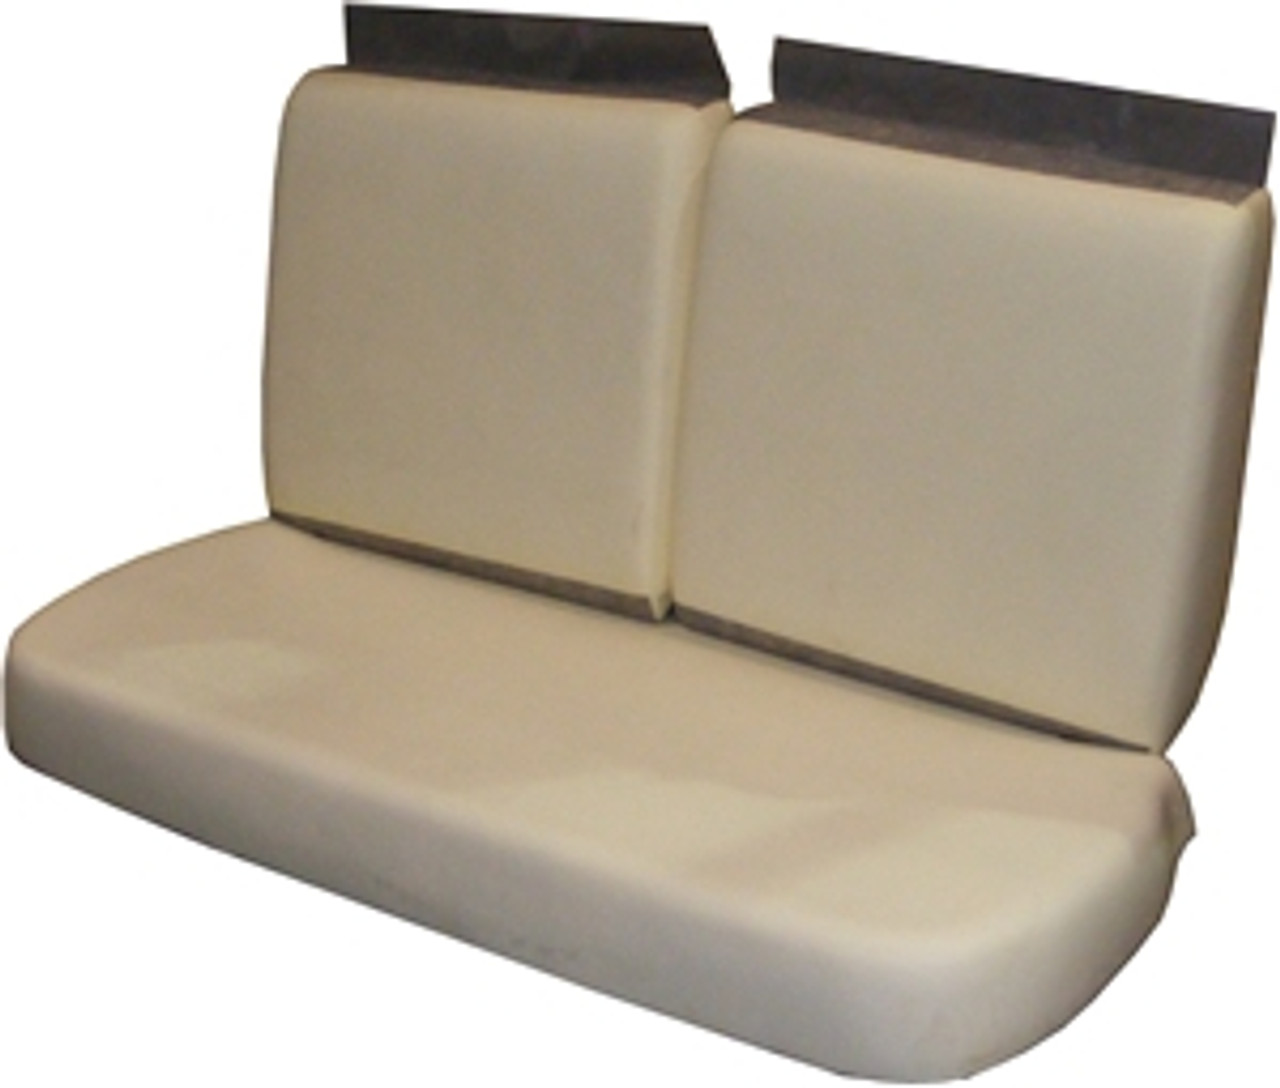 1968-1970 Chevelle Bench Seat Bun